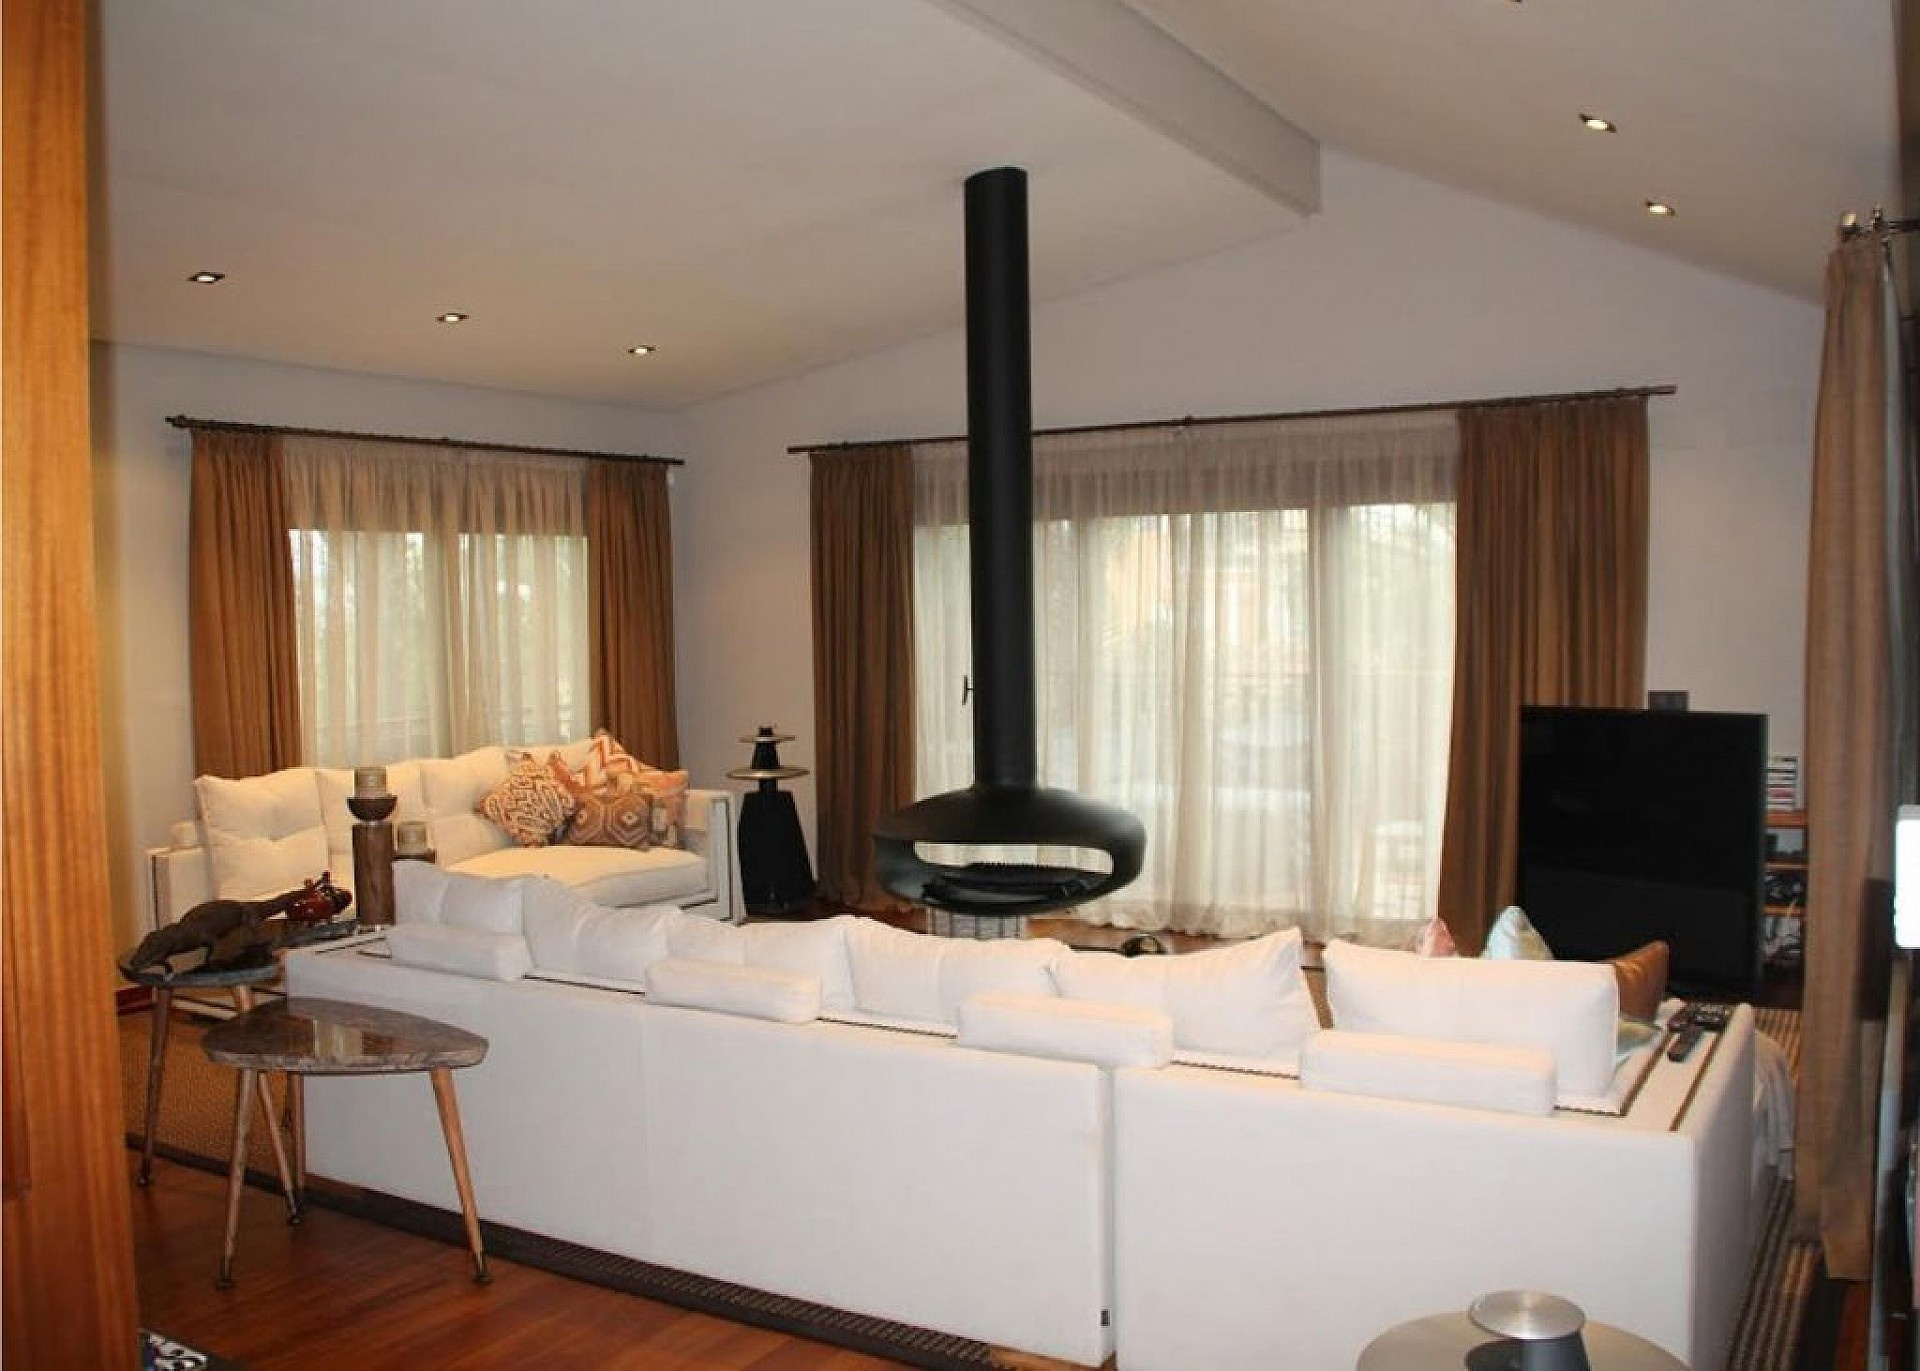 w_denia-huis-tekoop-costa-blanca-spanje-22.jpg